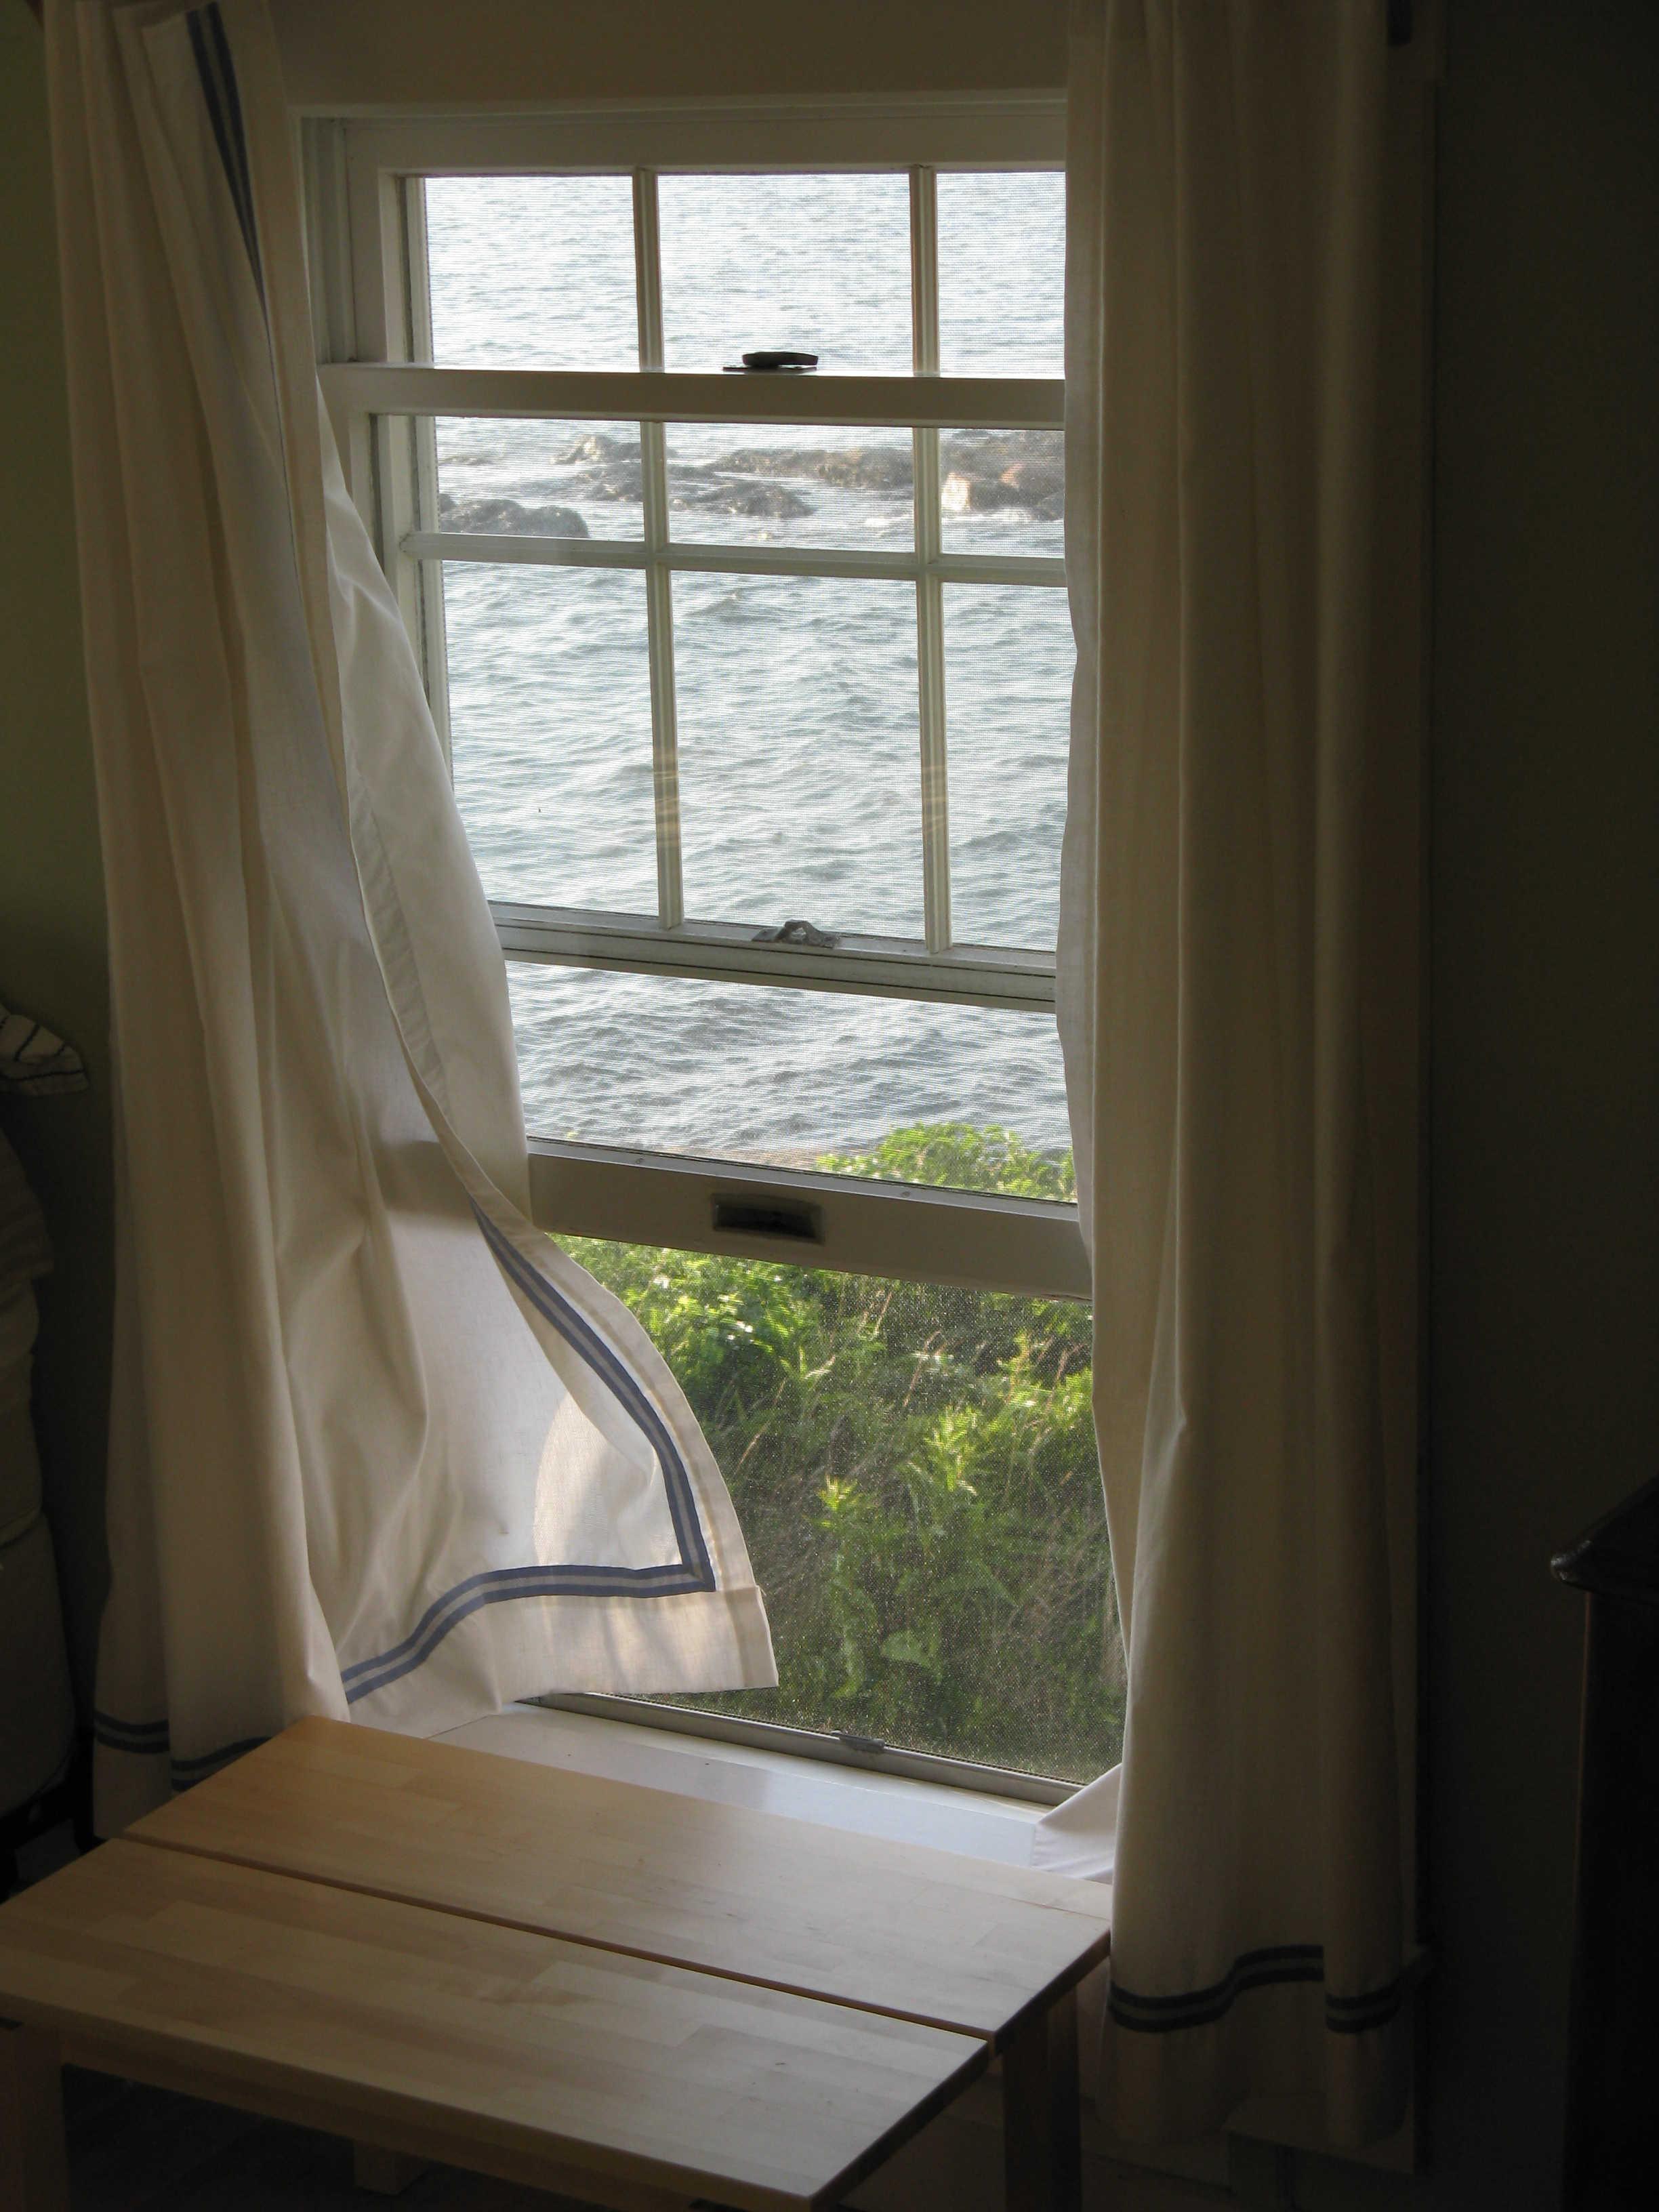 Rhode Island window view